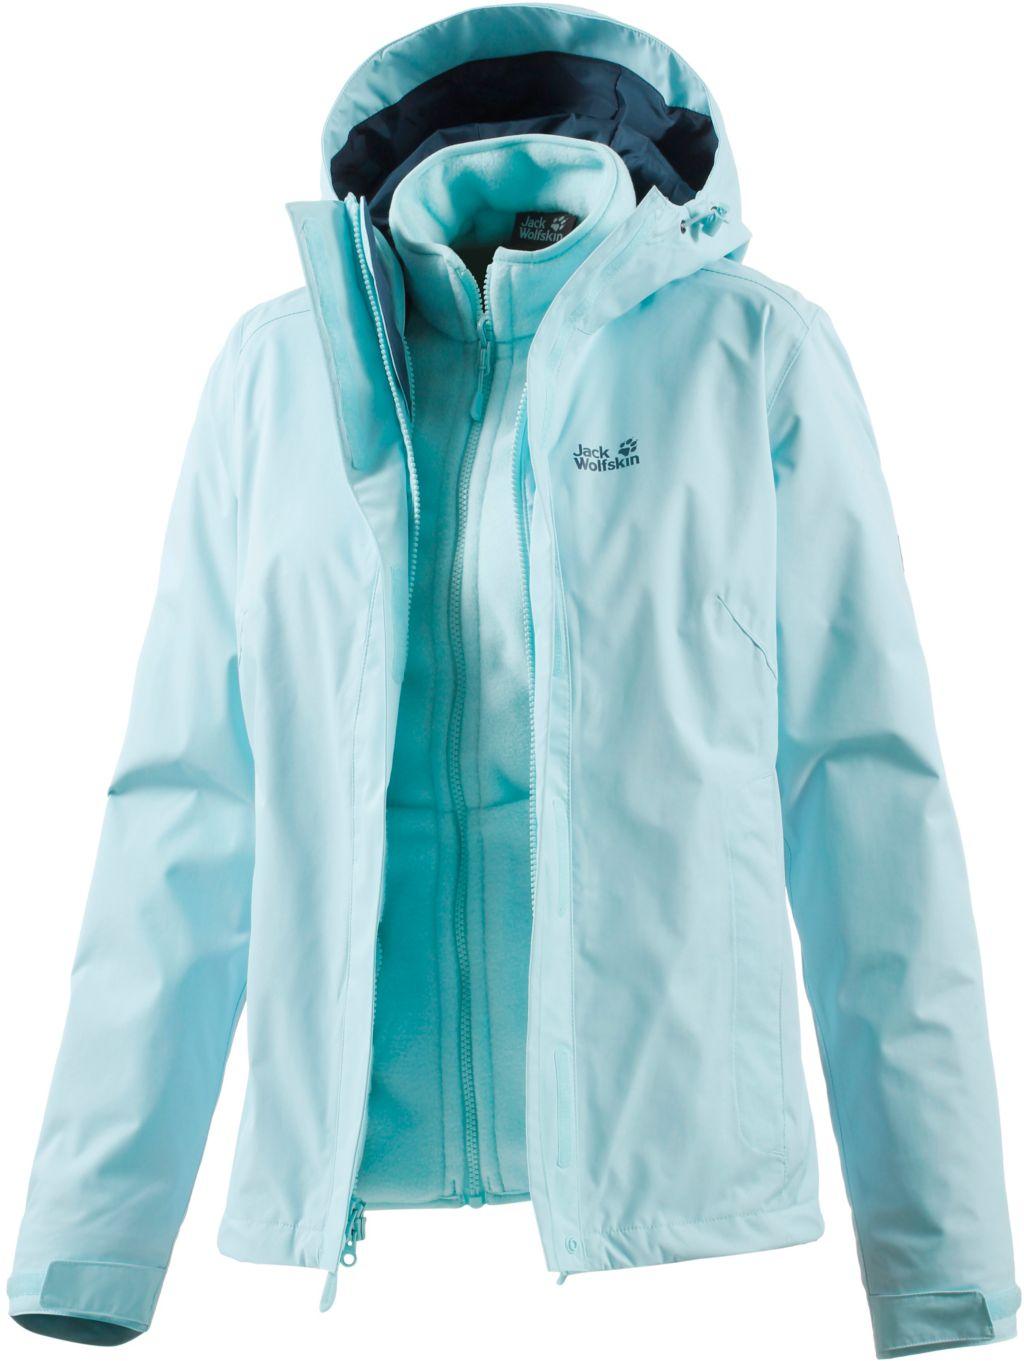 Crush´n Ice Doppeljacke Damen in blau, Größe S